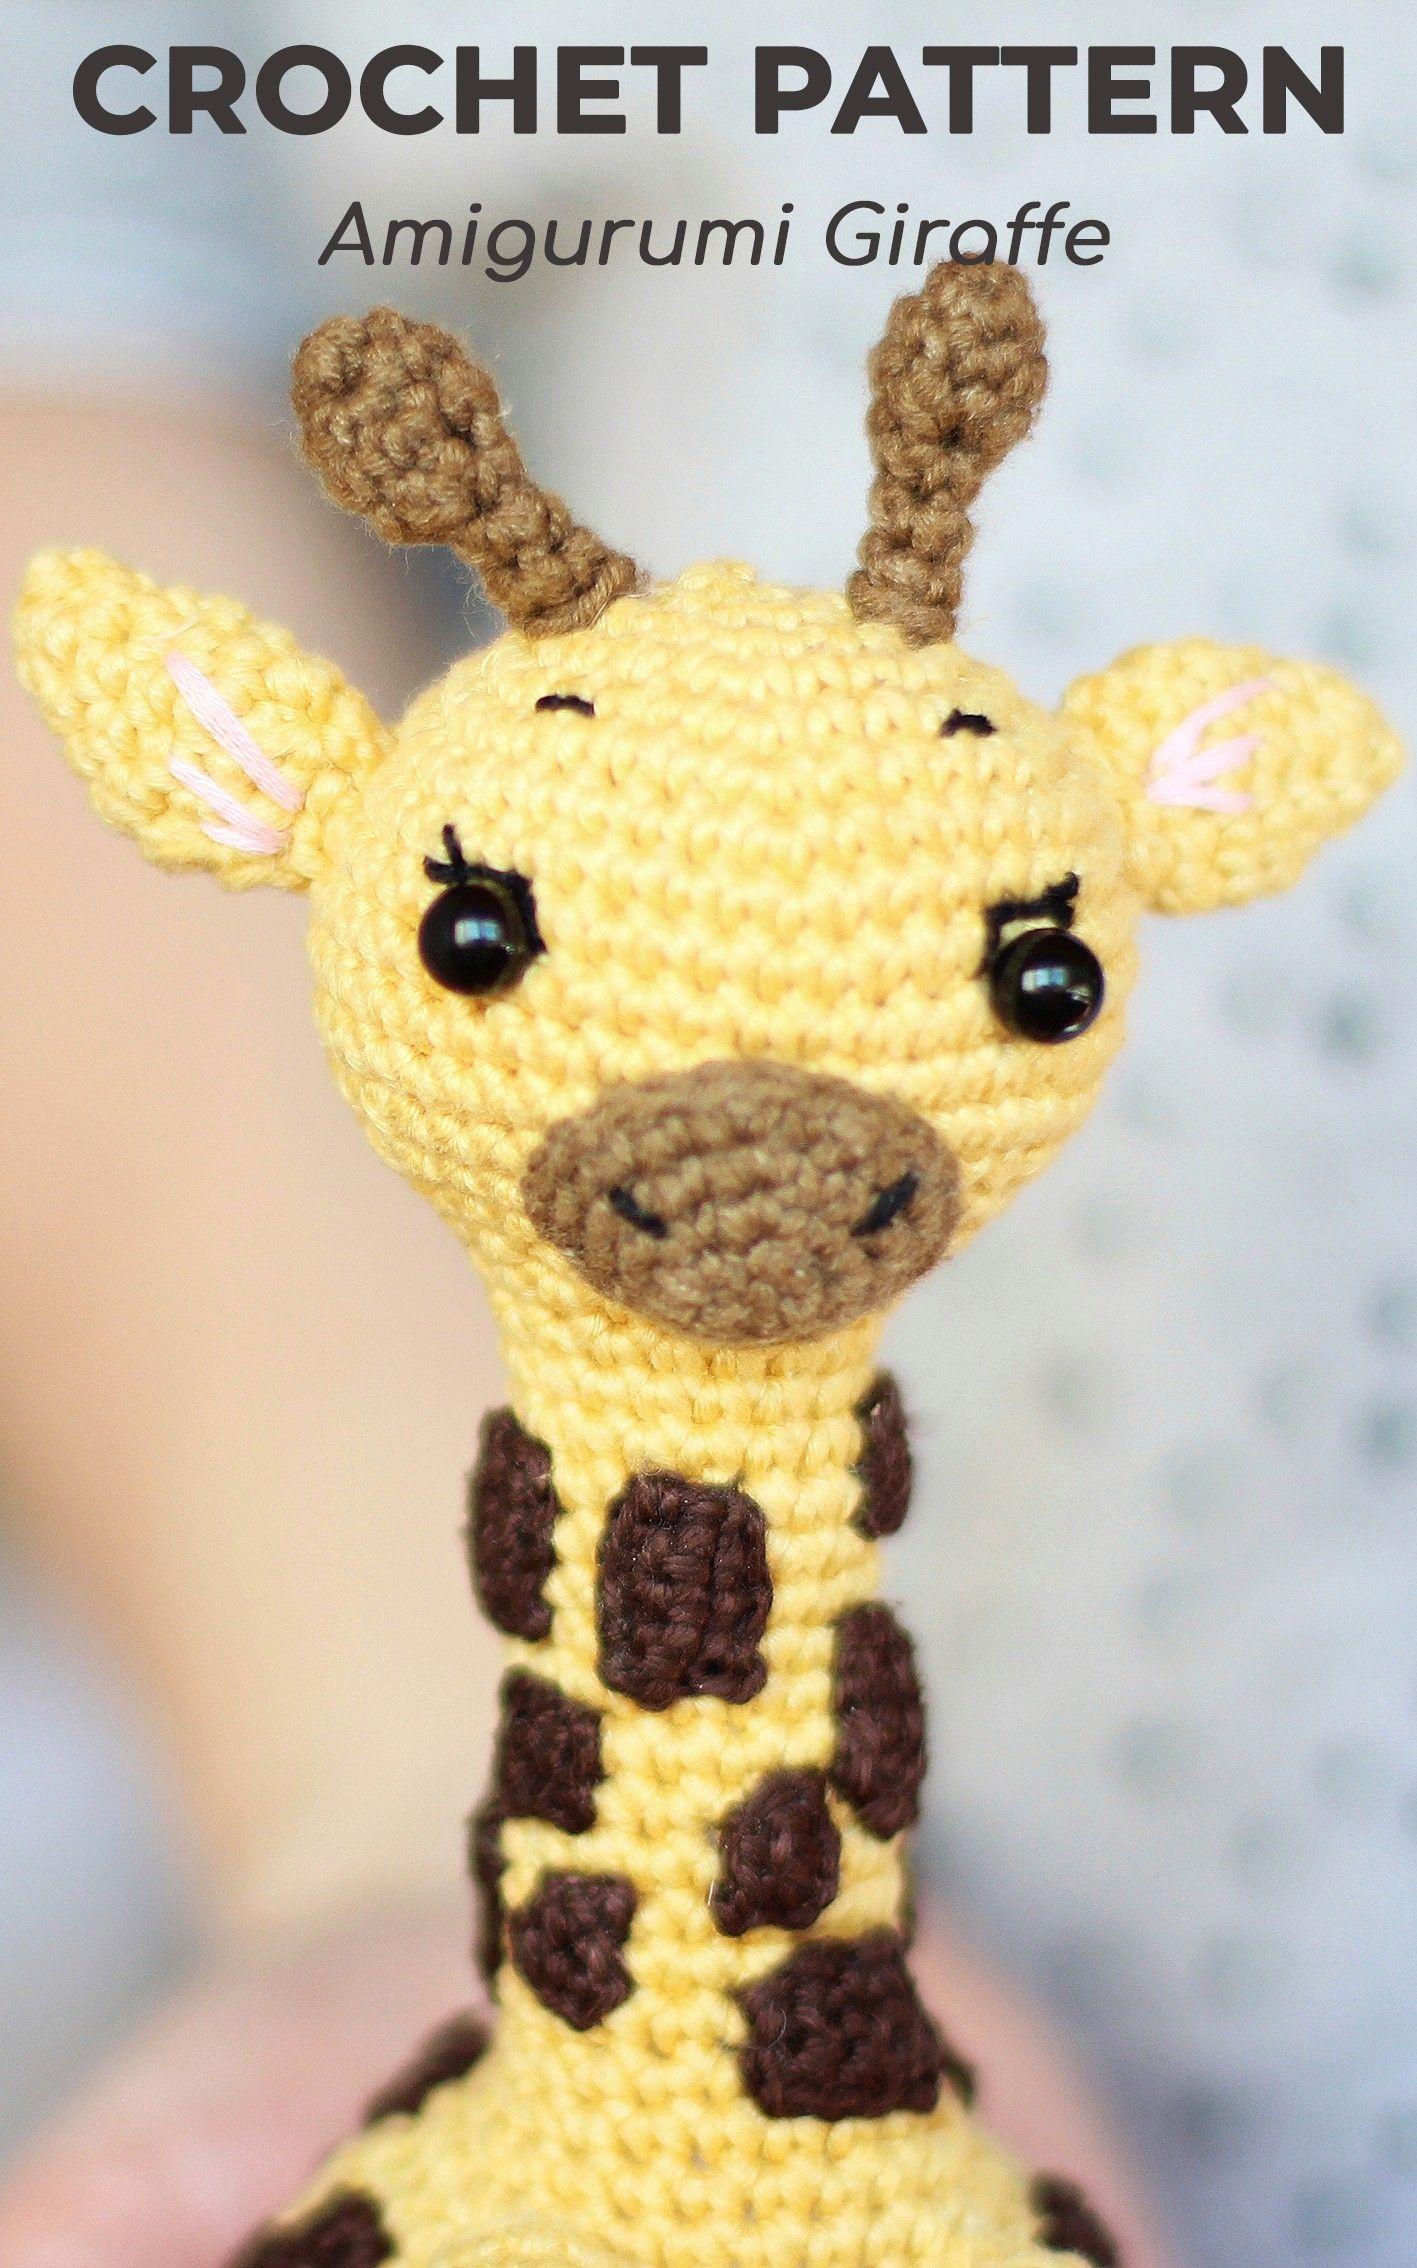 Crochet Giraffe PATTERN Amigurumi giraffe pattern pdf tutorial ... | 2268x1417